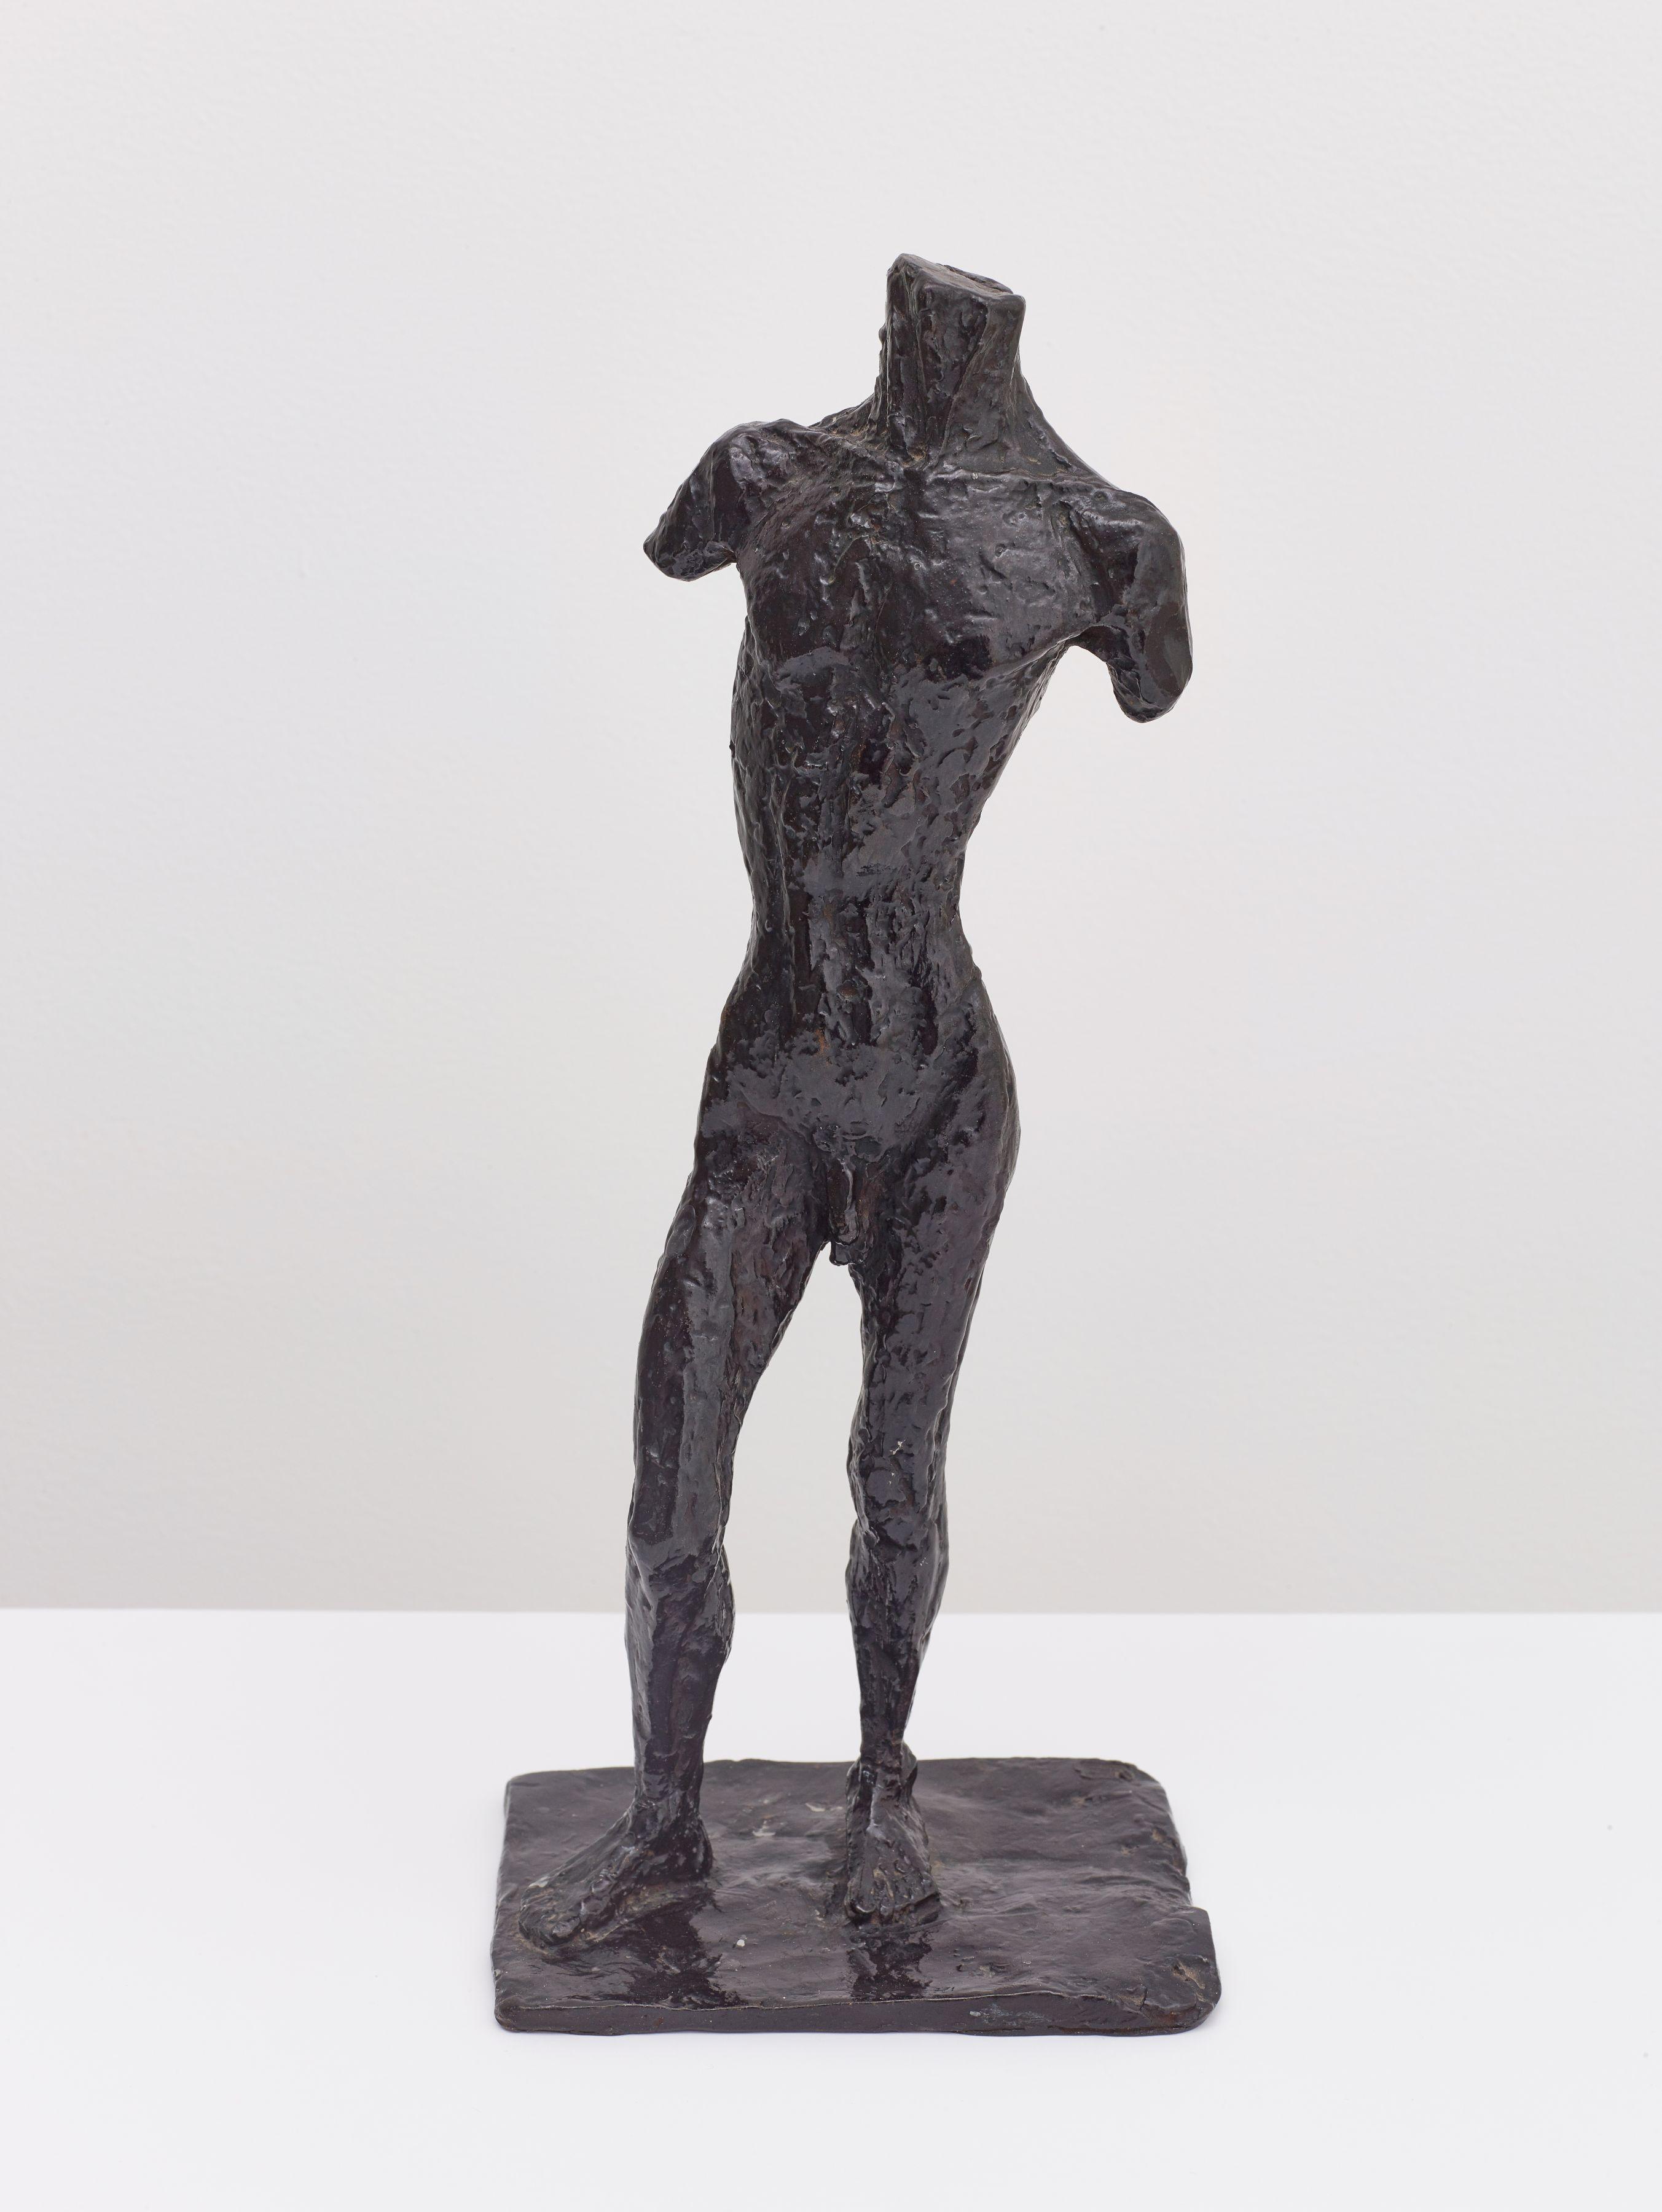 Untitled (Male Figure) (c. 1922)